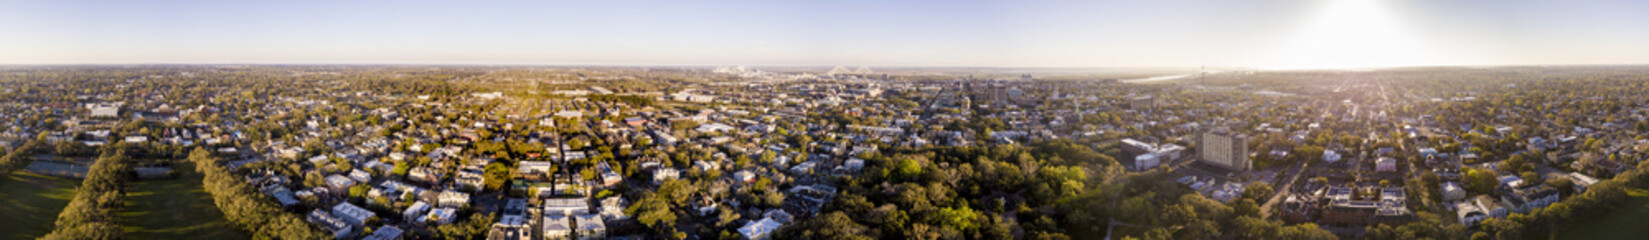 360 degree aerial seamless panorama of Savannah, Georgia.